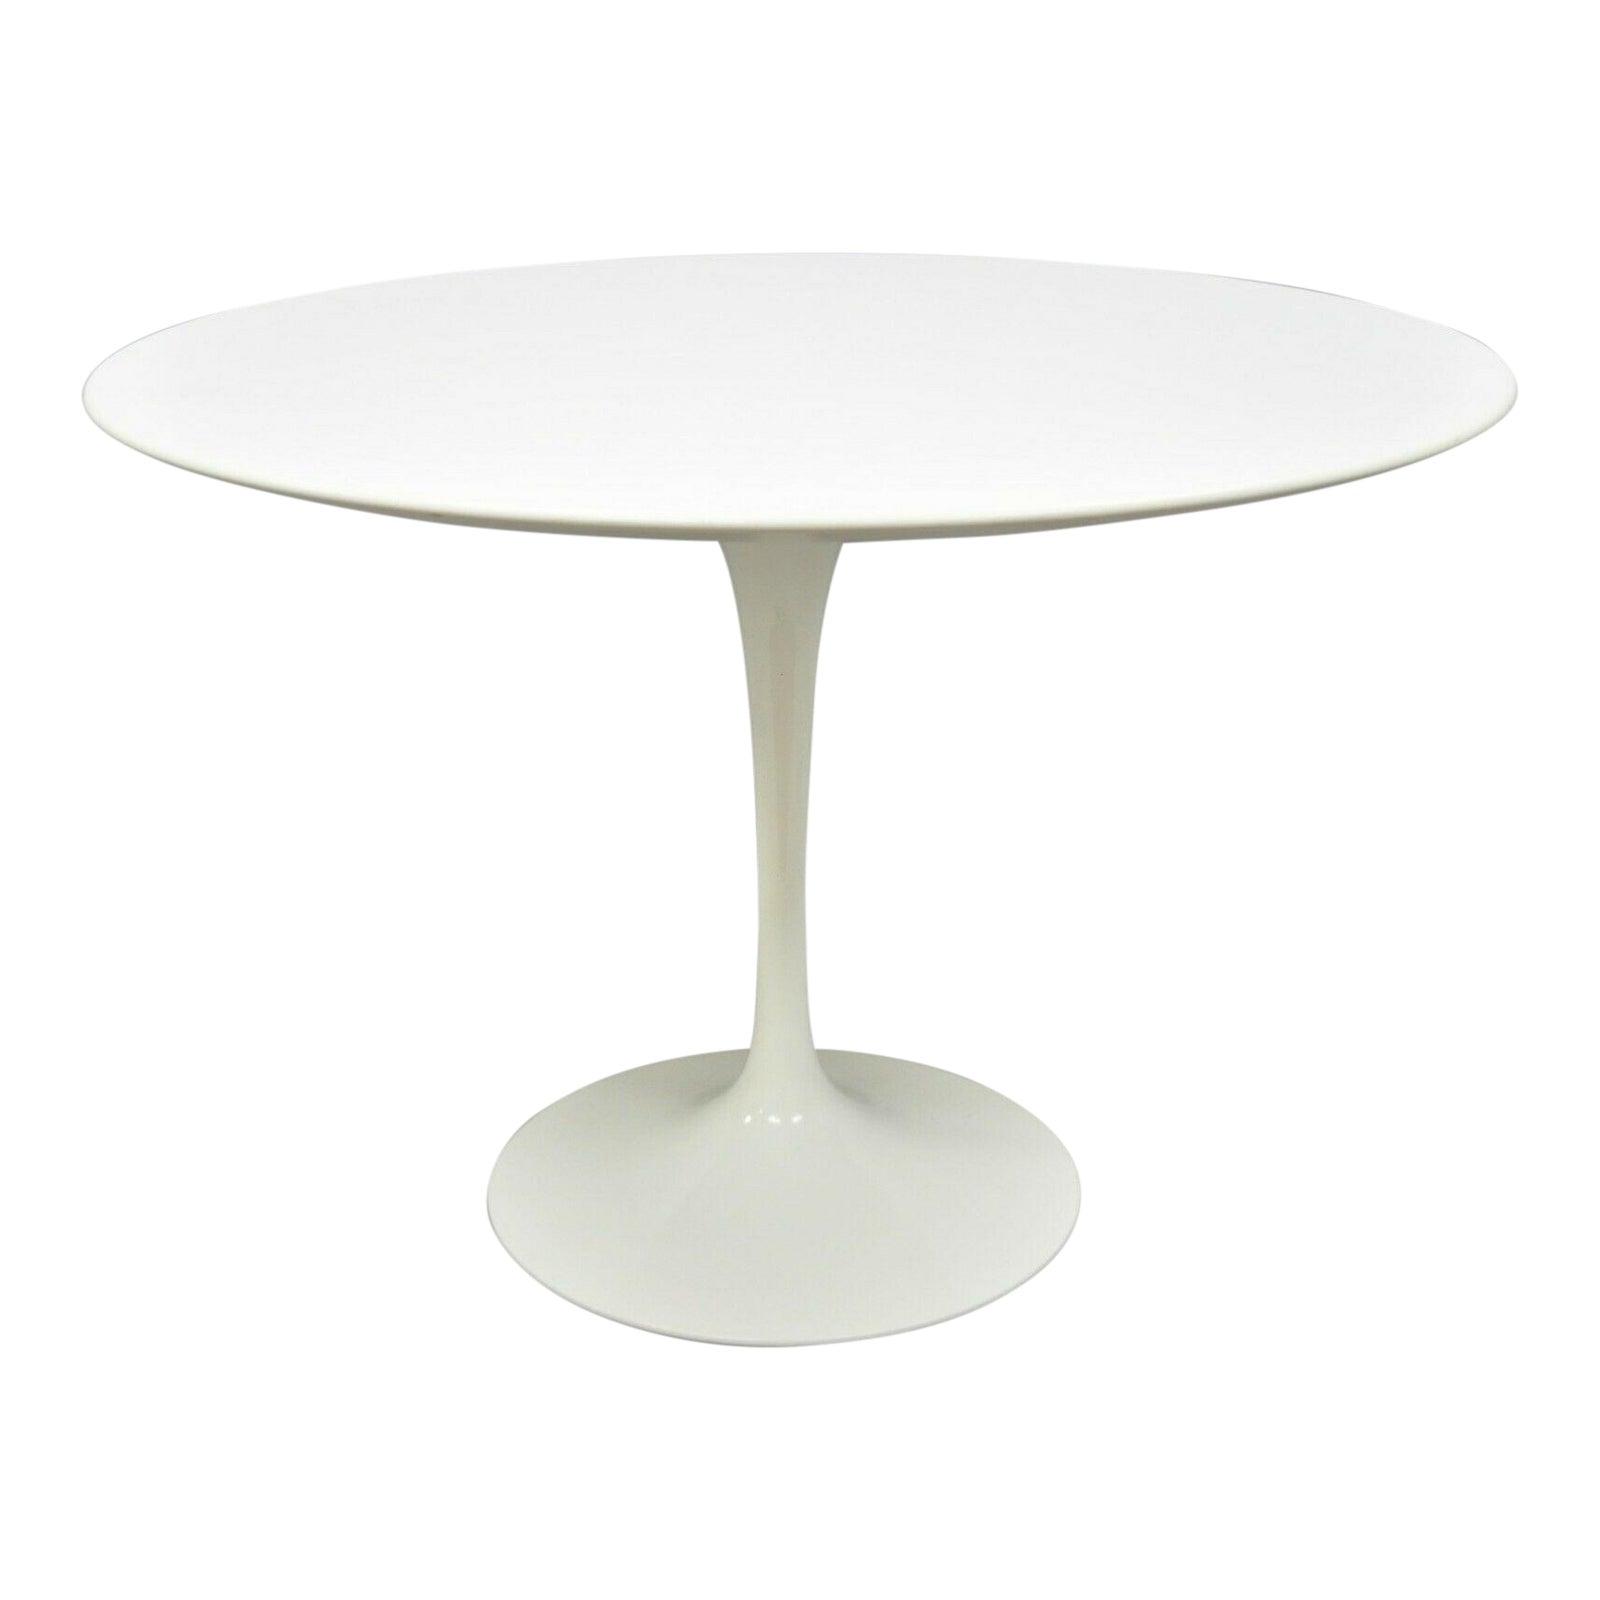 dining table_8_chairish.jpg